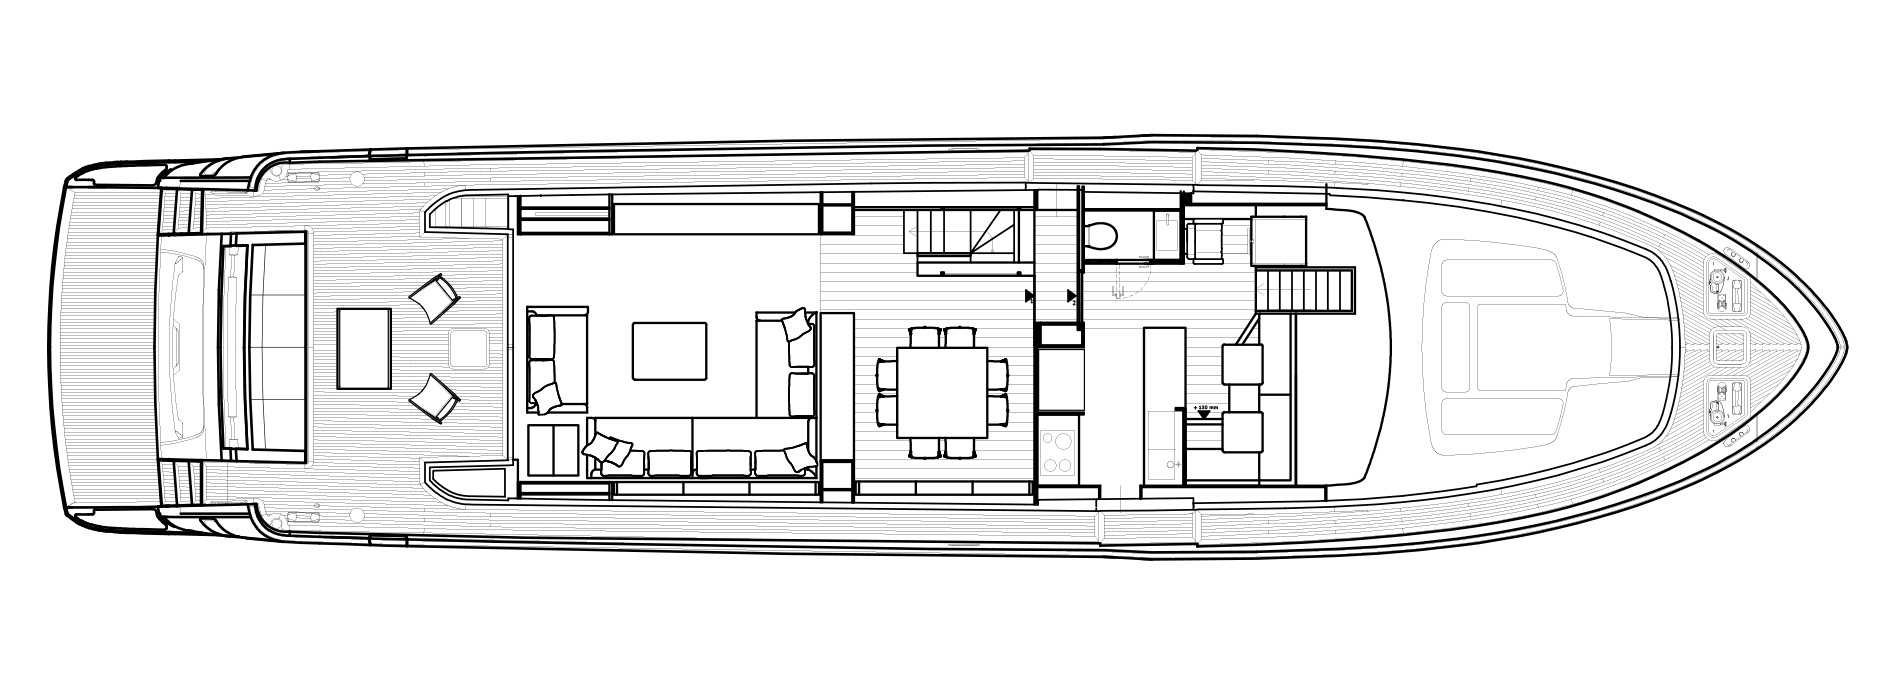 Sanlorenzo Yachts SL86 Hauptdeck Versione USA